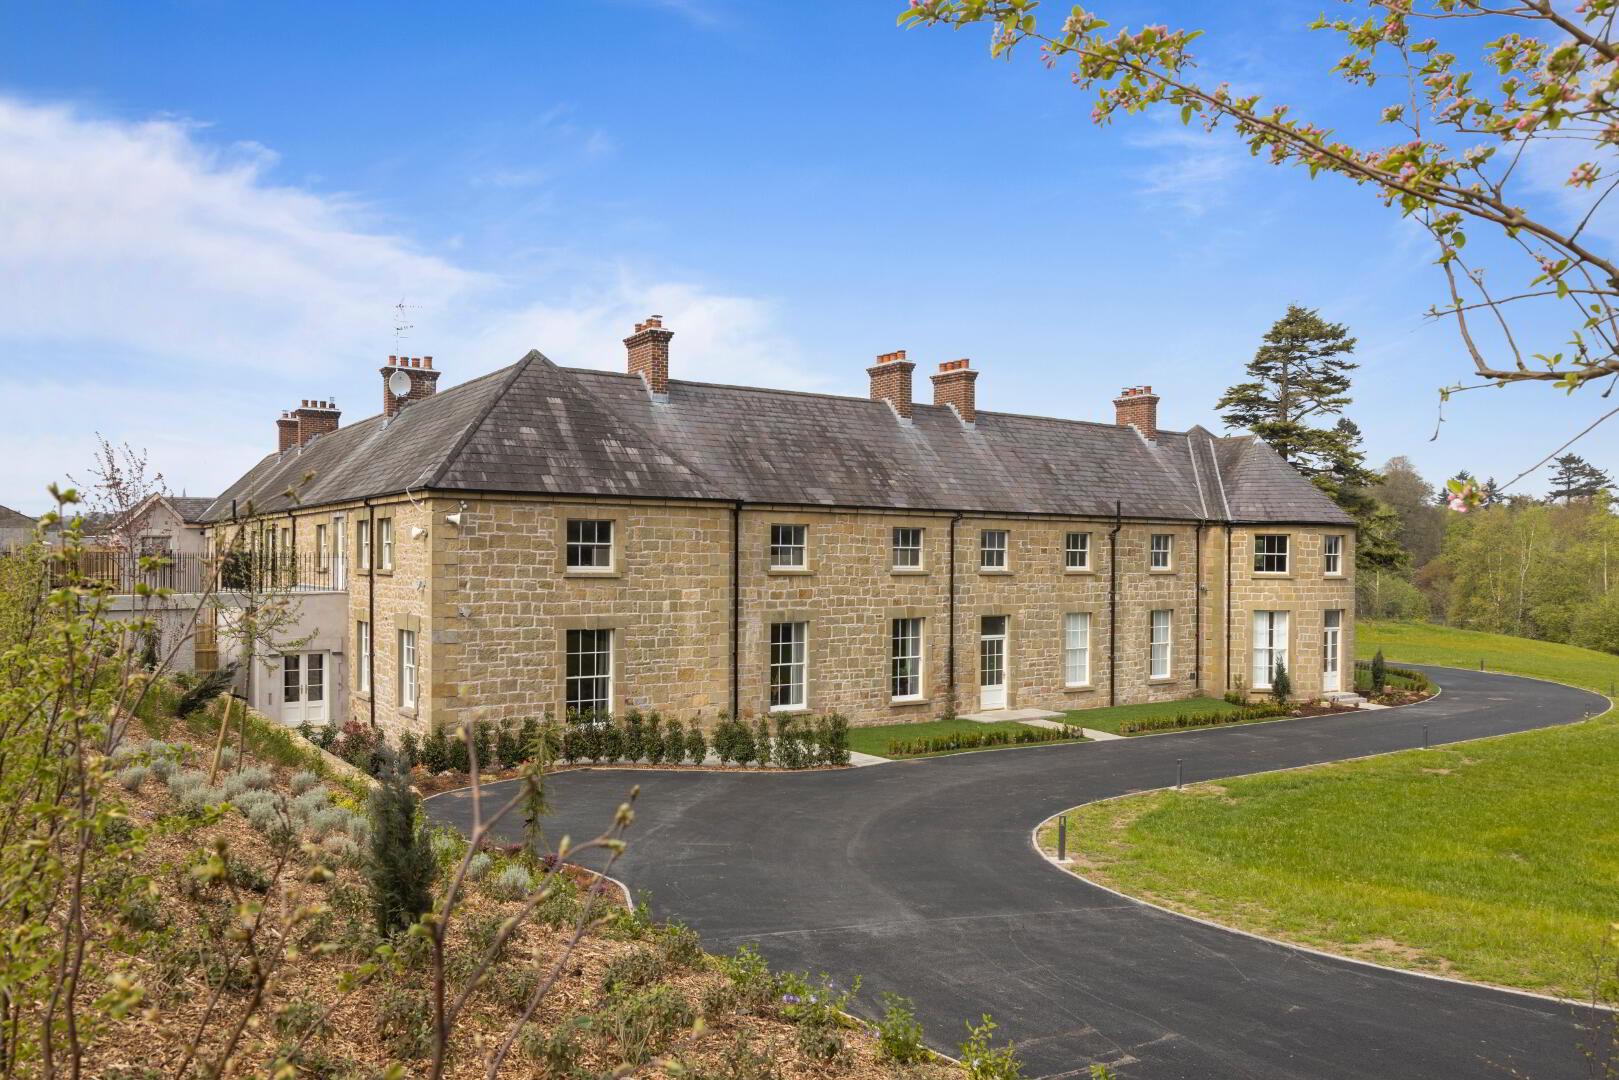 Photo 1 of The Belmont, Ballynorthland Manor, Ballynorthland Demesne, Dungannon